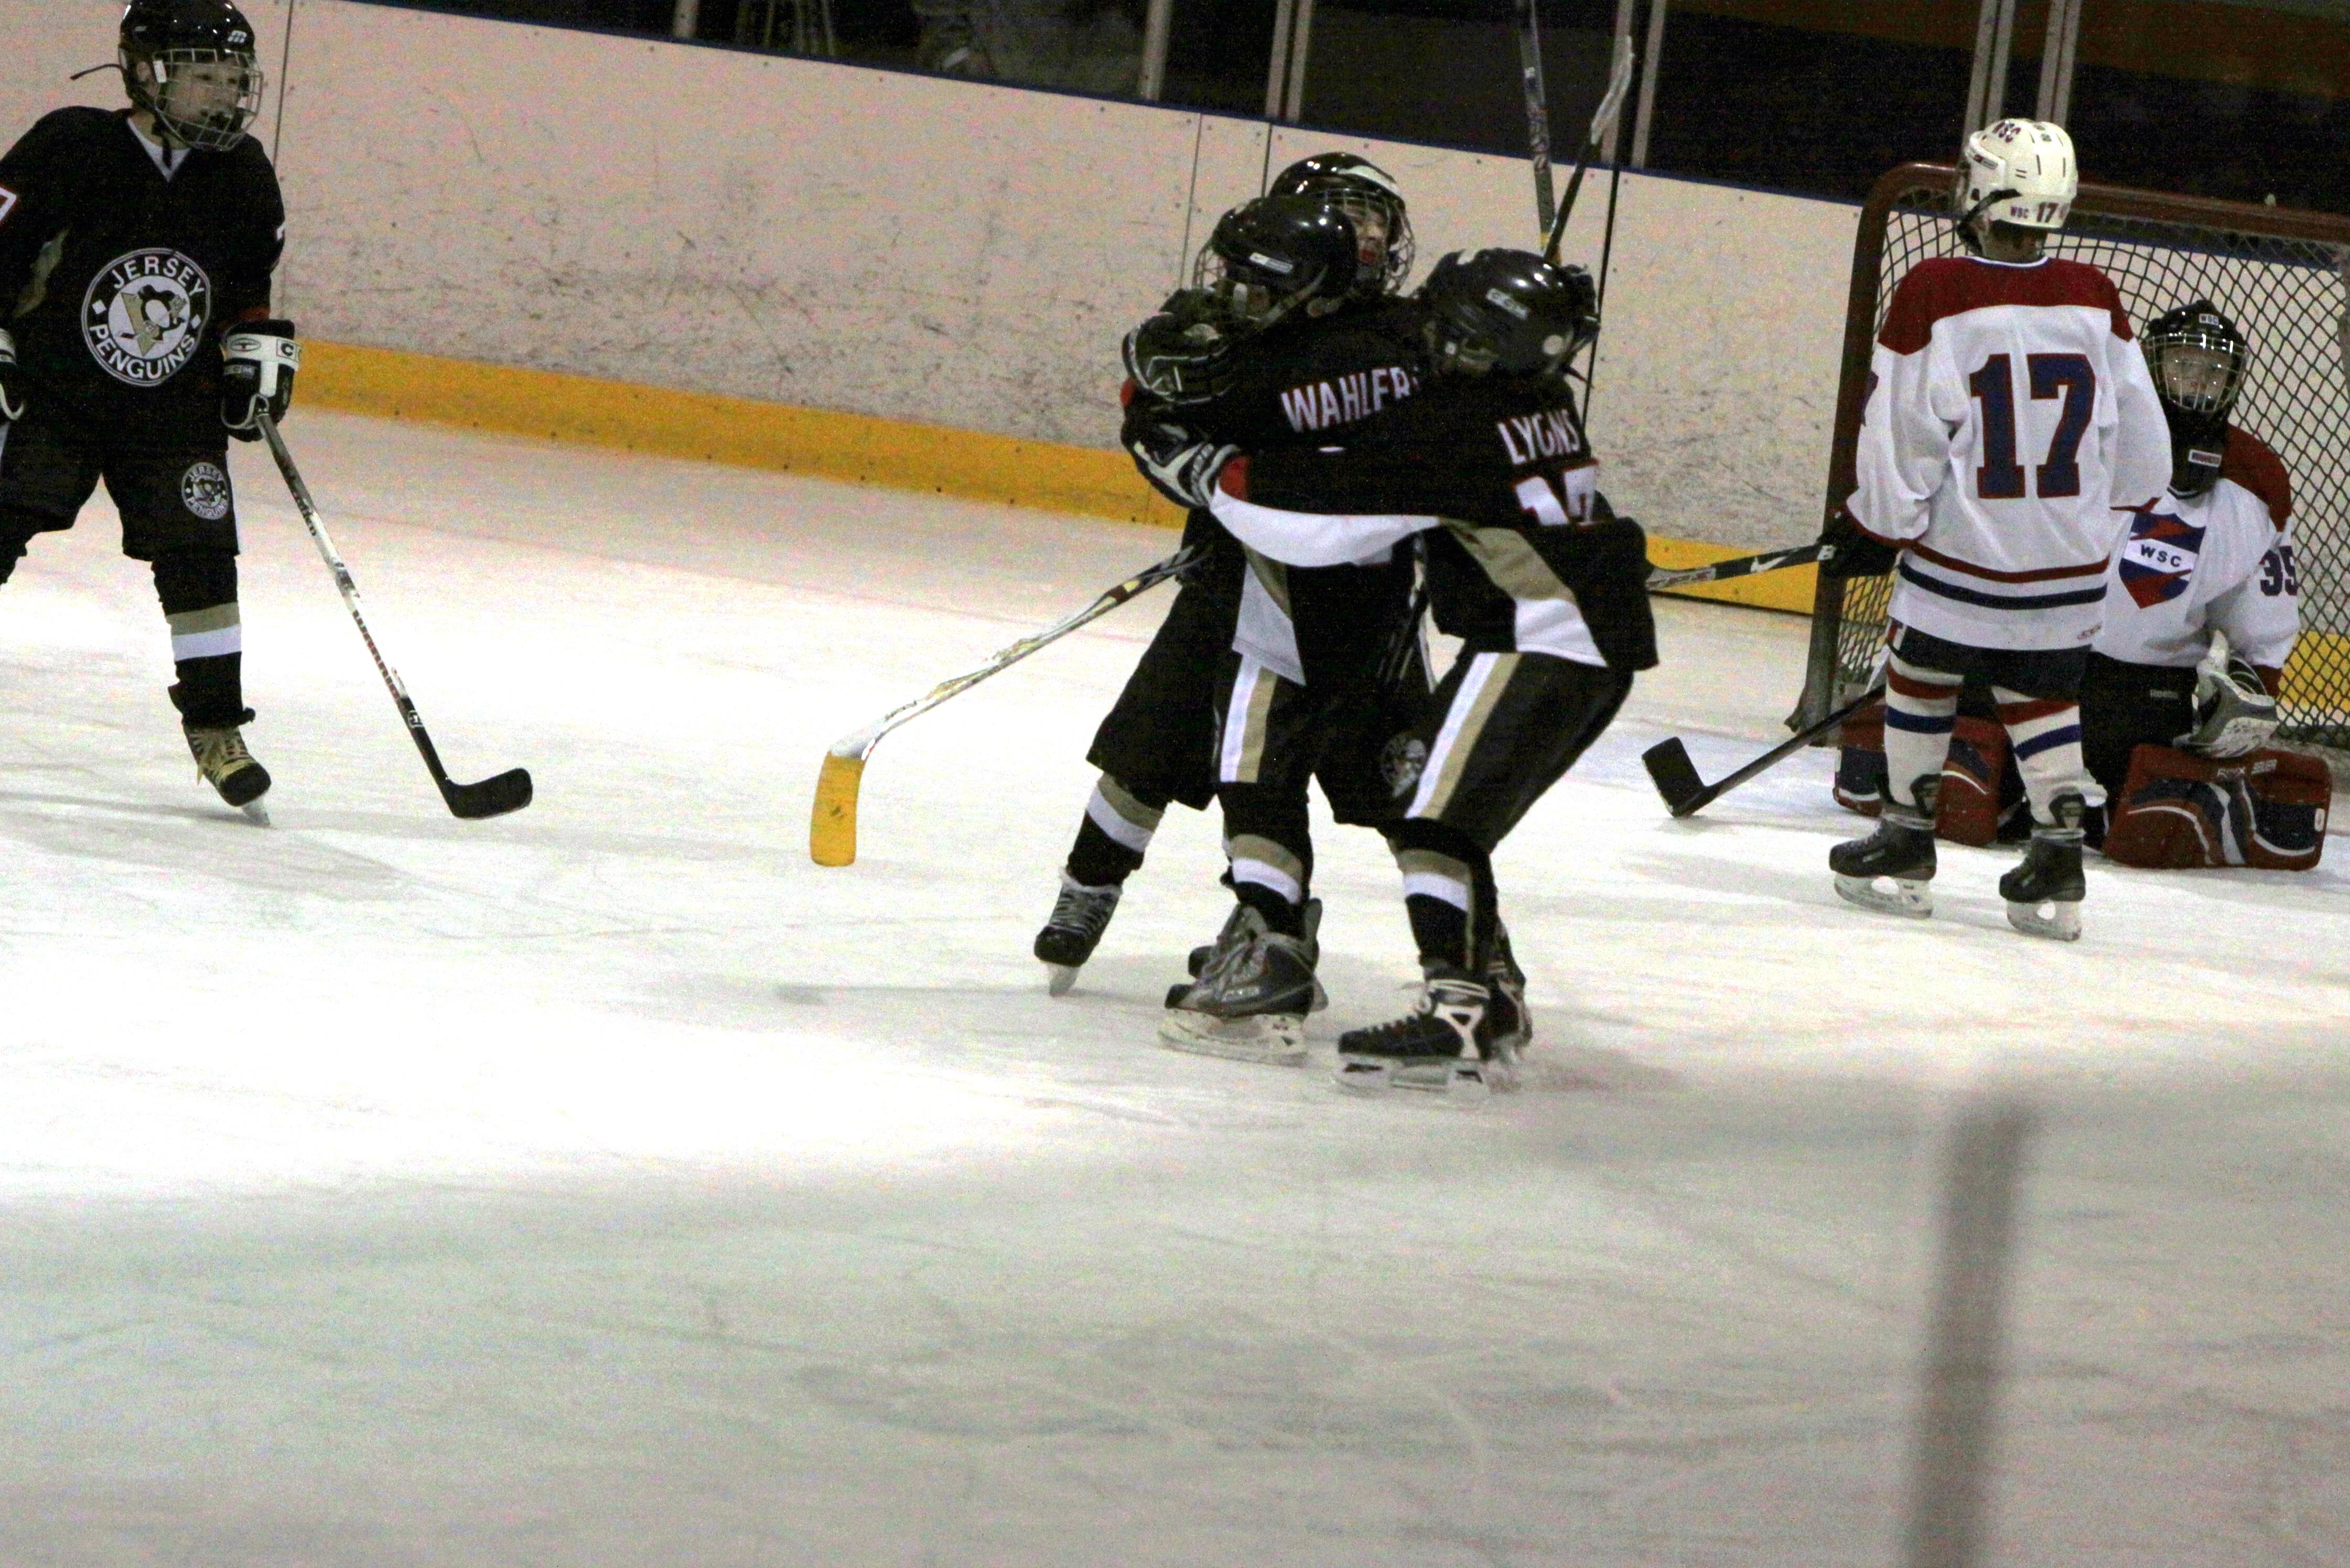 Jersey penguins midget hockey